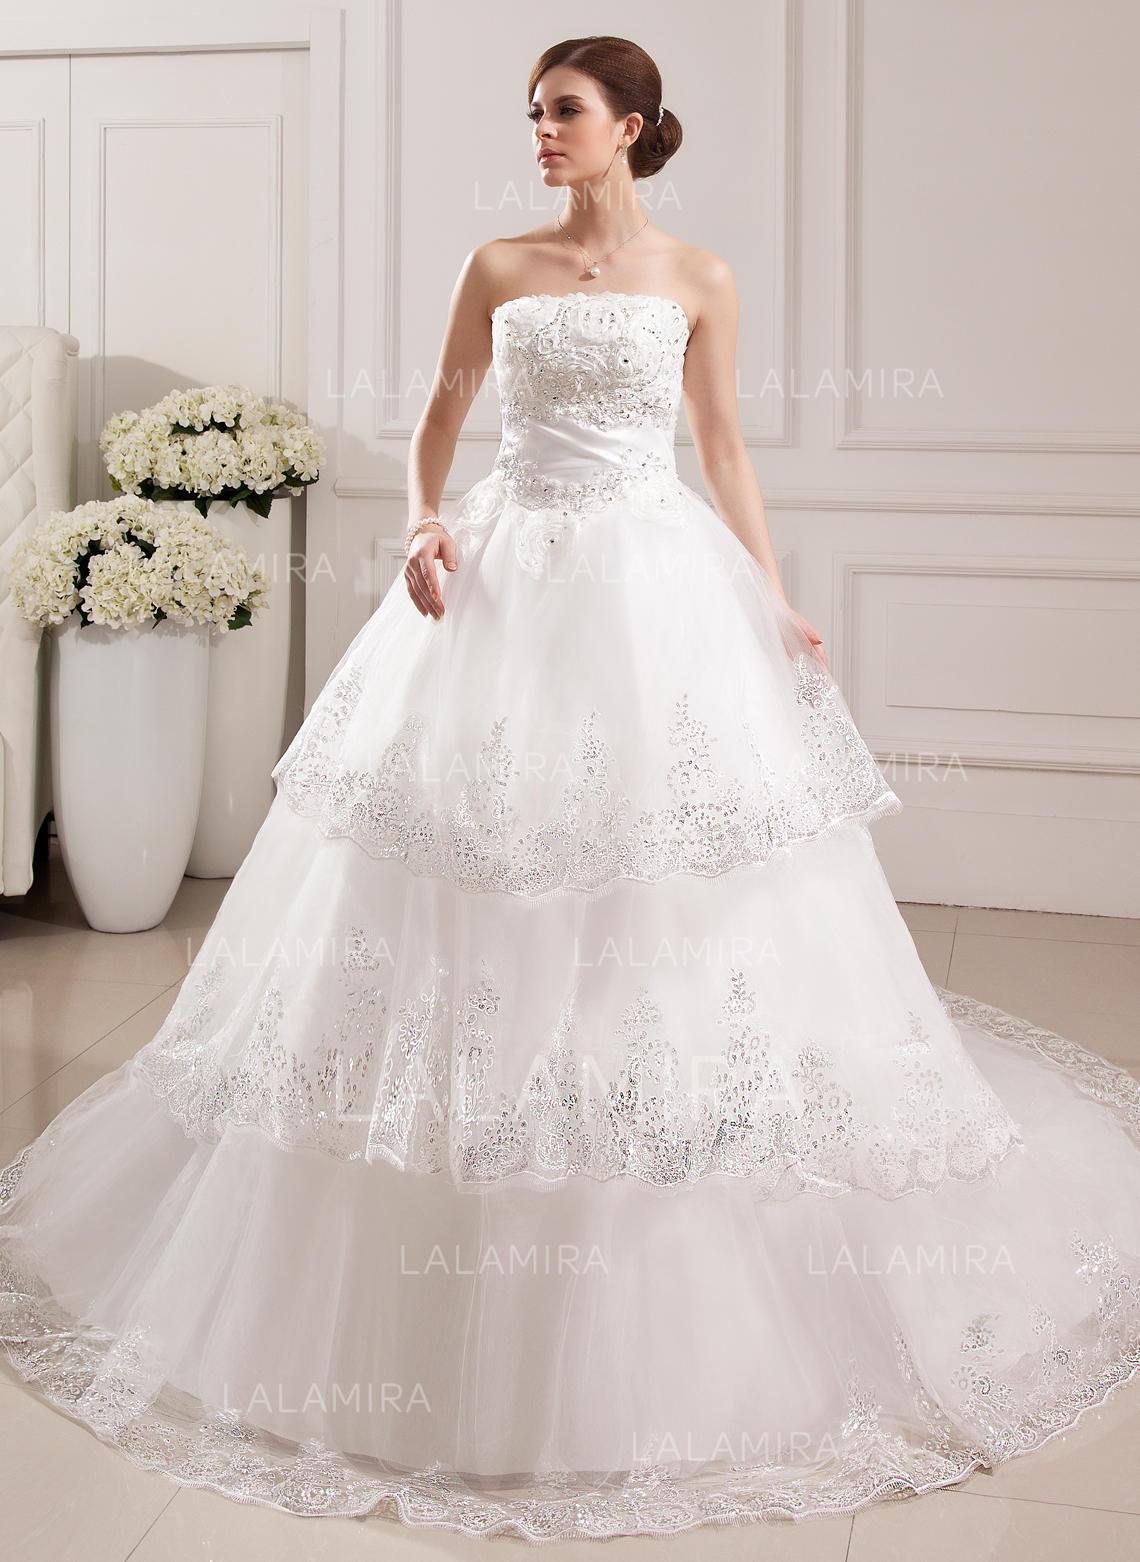 lace beading flower(s) sleeveless strapless tulle ball-gown wedding dresses